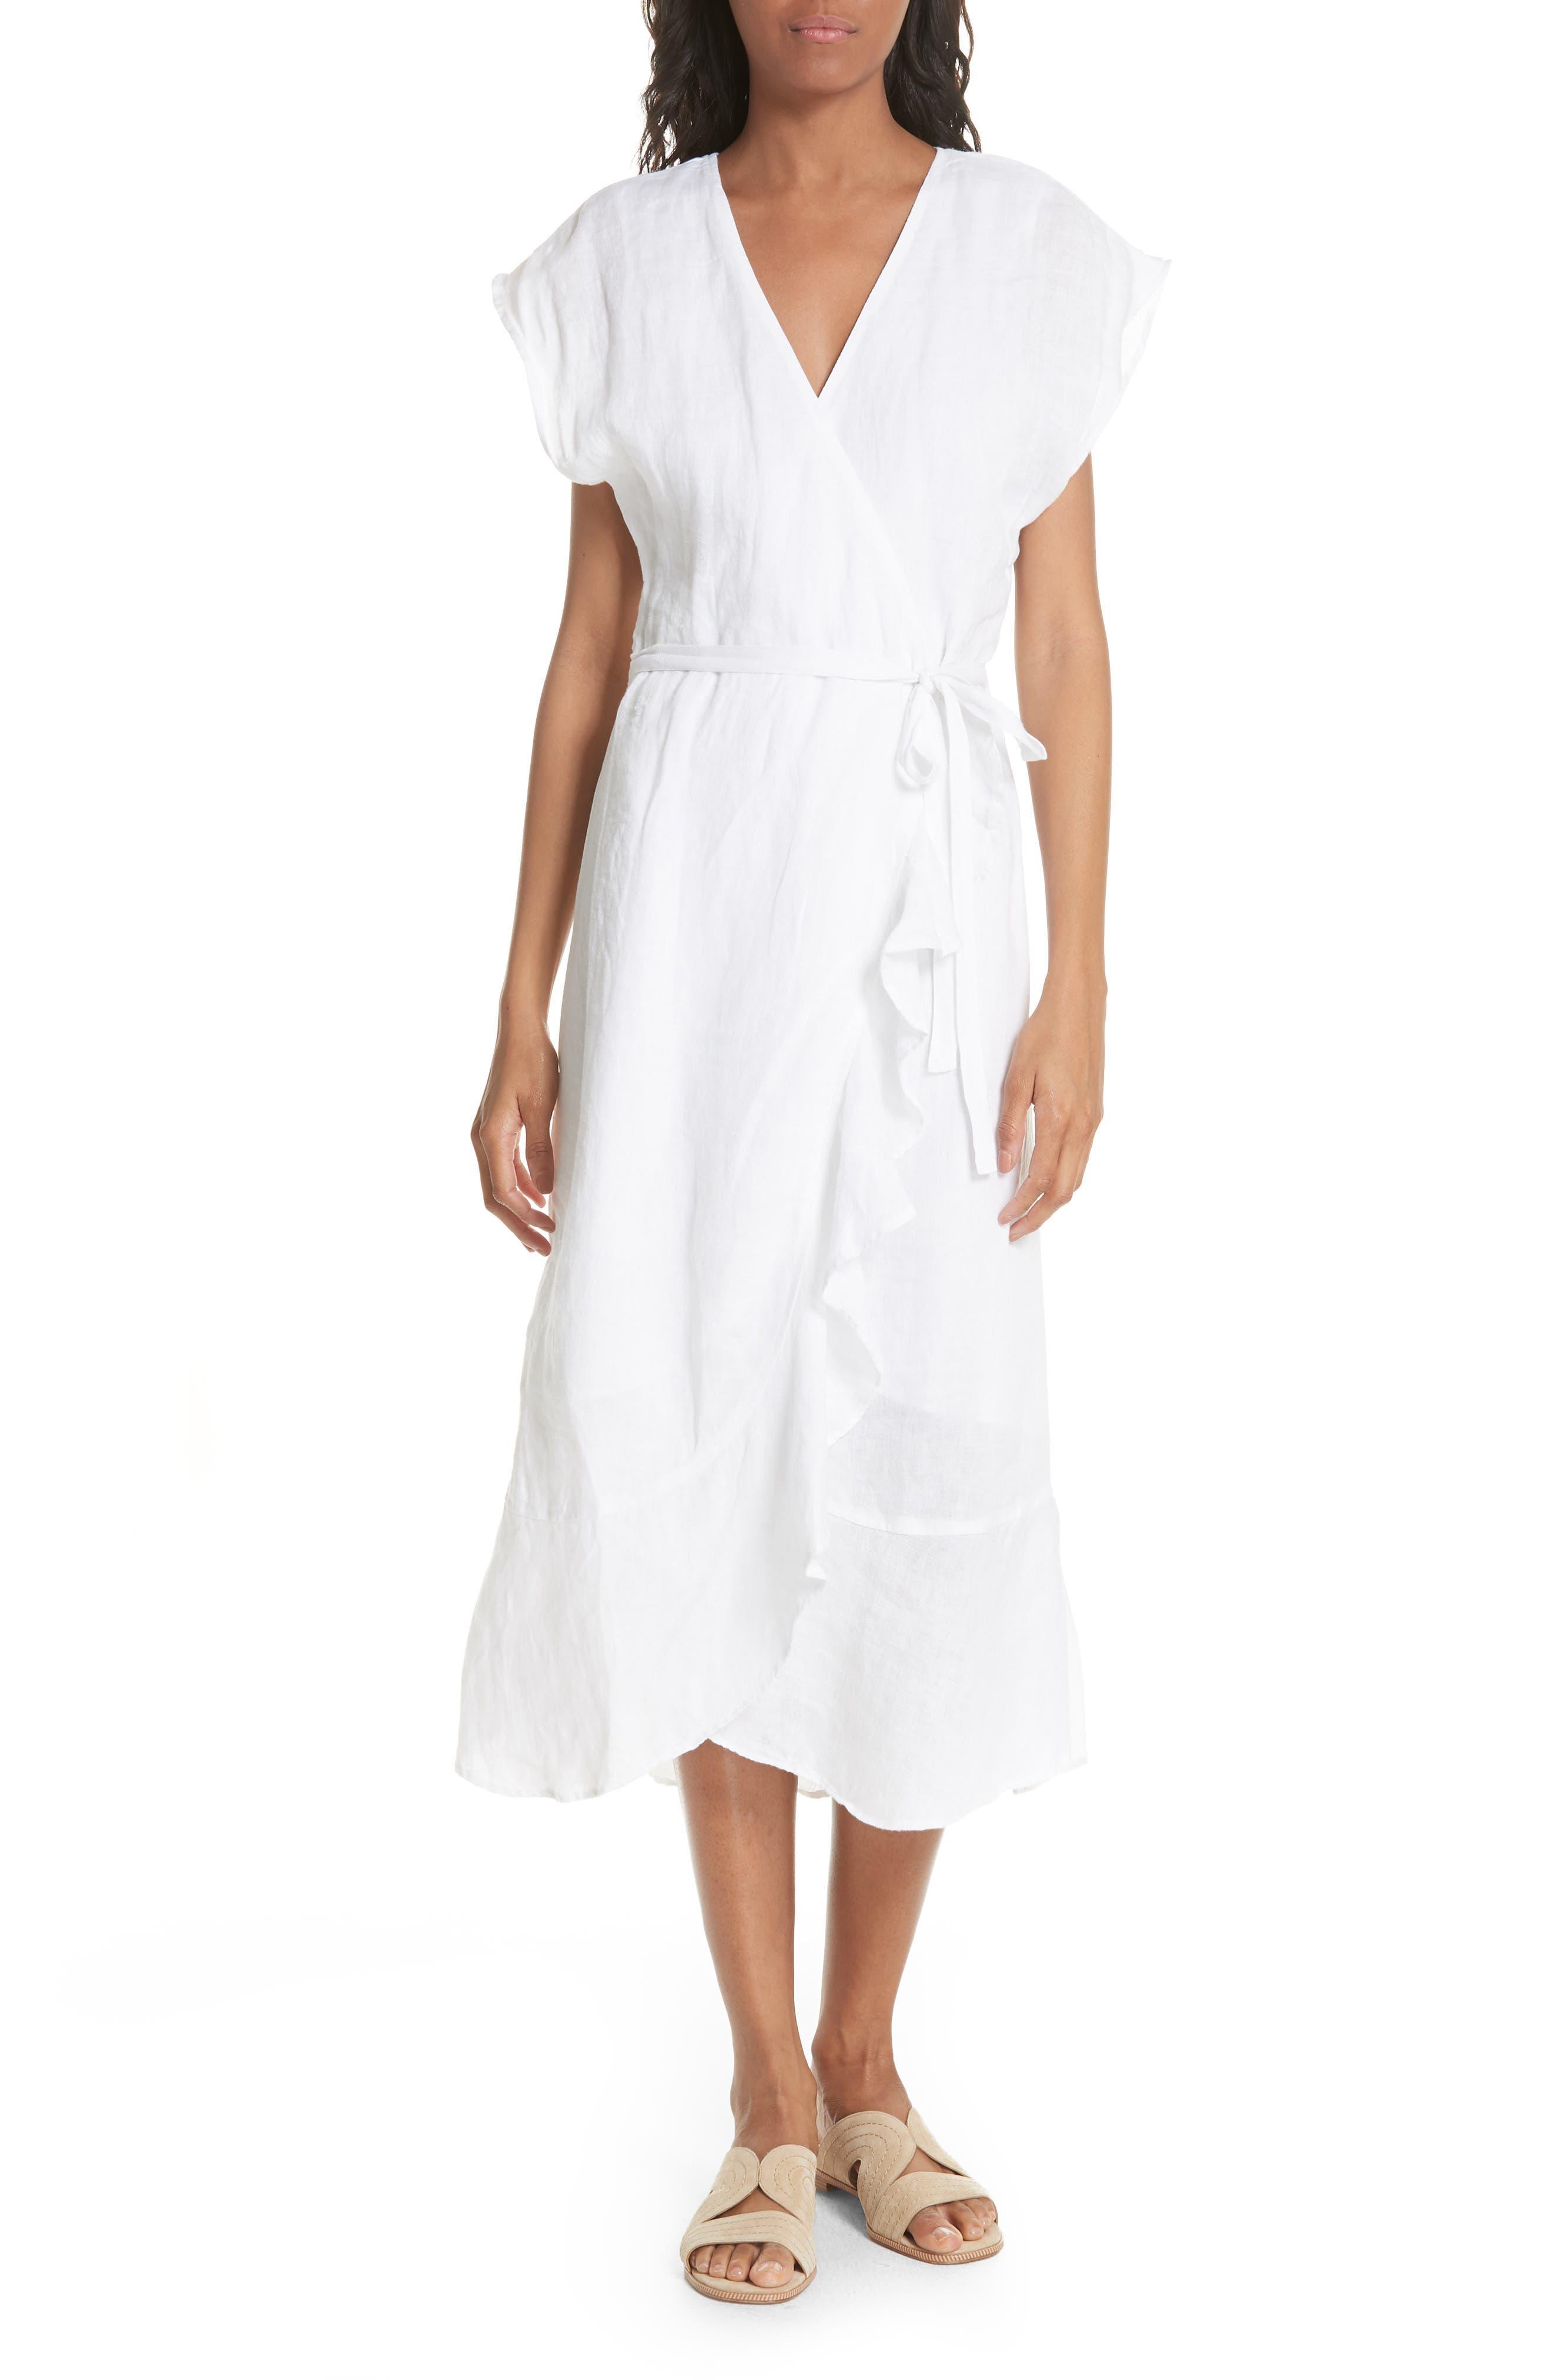 Filma Back Cutout Linen Wrap Dress,                         Main,                         color, 120